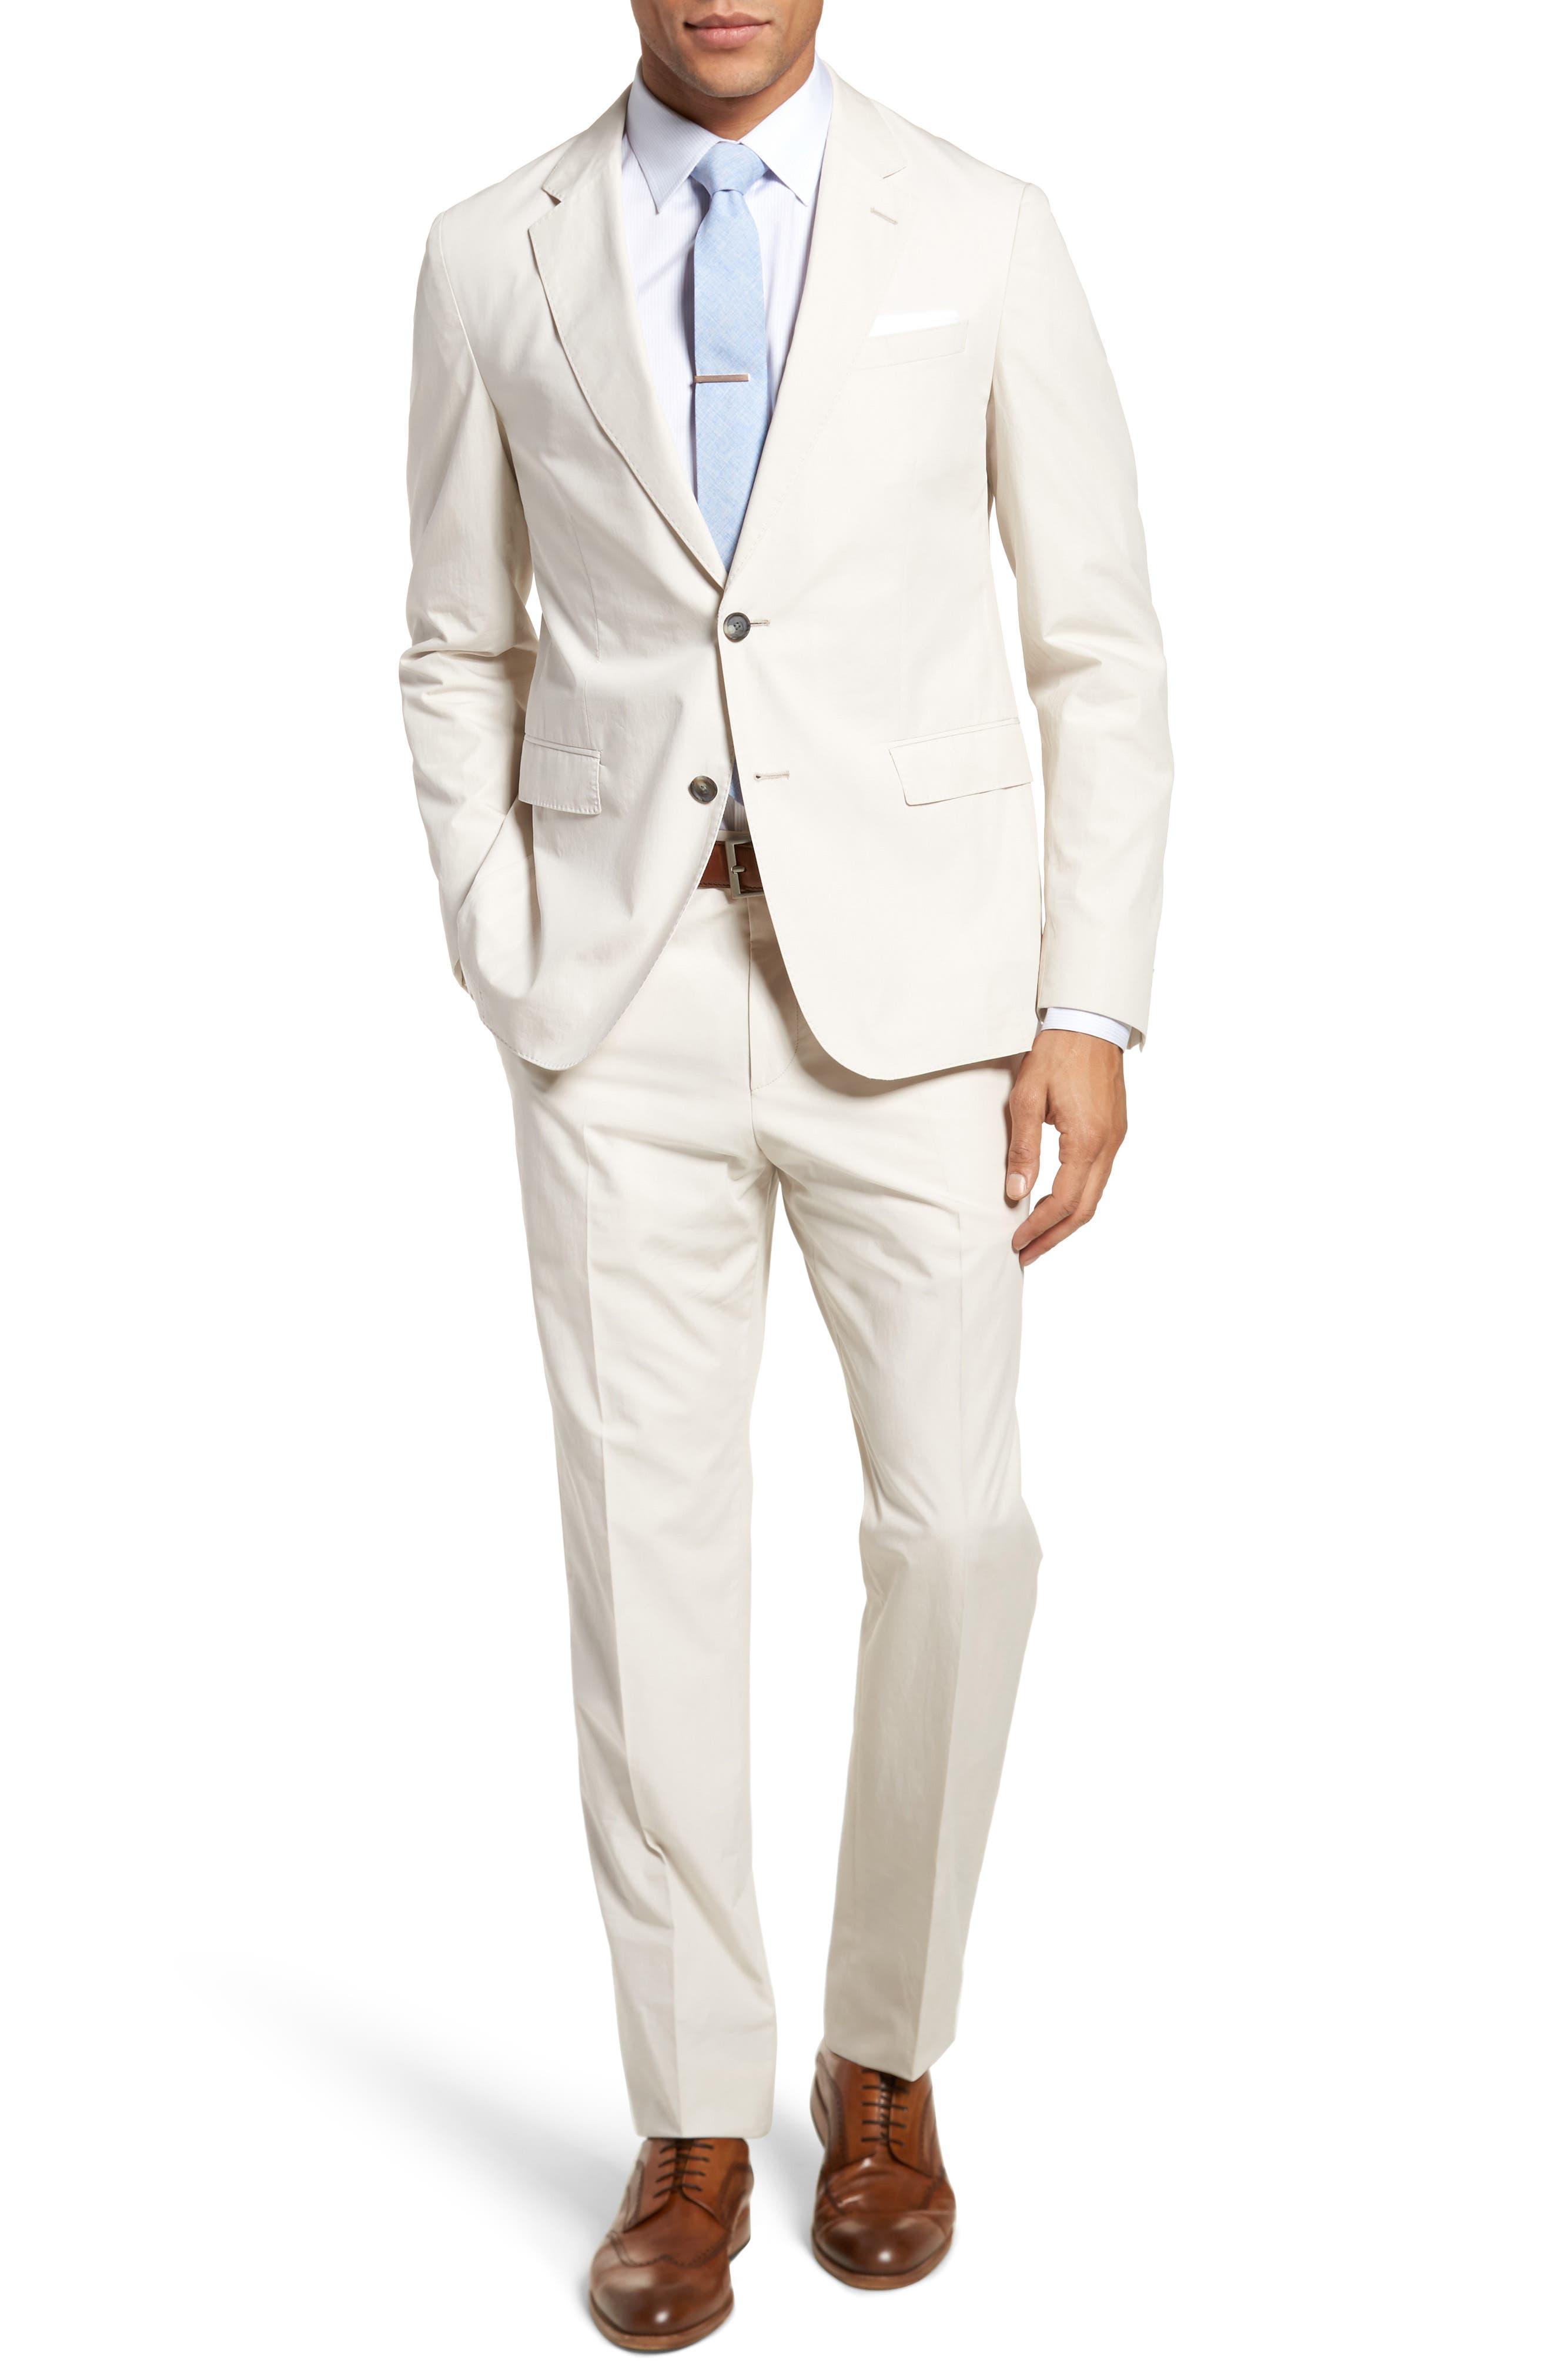 Nylen/Perry Trim Fit Solid Cotton Suit,                             Main thumbnail 1, color,                             Ivory